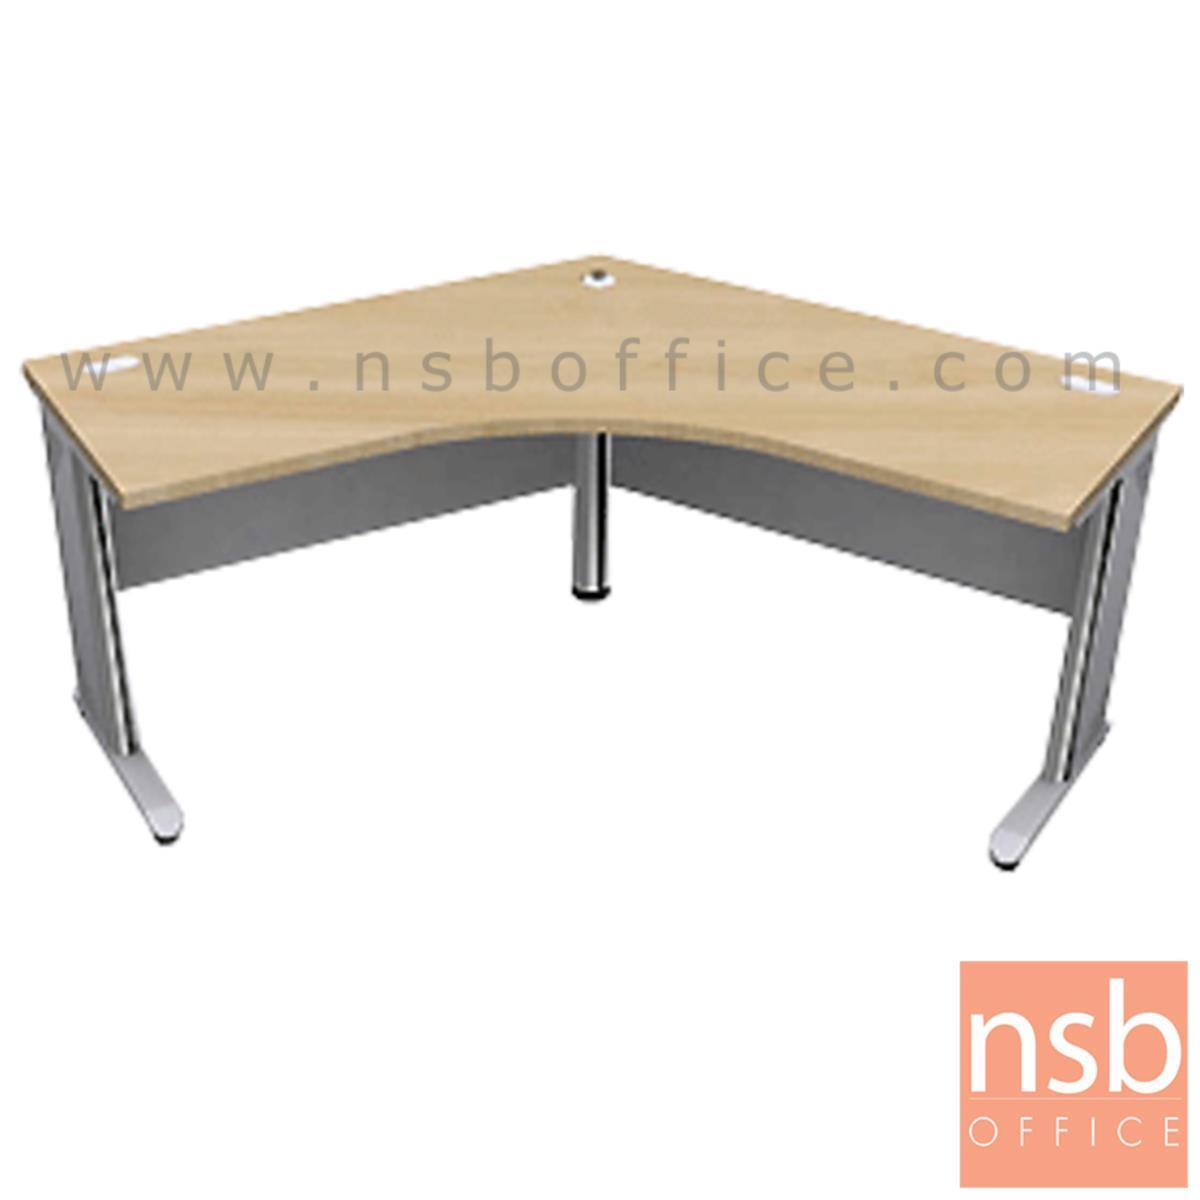 A18A020:โต๊ะทำงานตัวแอลหน้าโค้งมุมเมอแรง รุ่น Pinkett (พิงคิตต์) ขนาด 120W1*120W2 cm. ขาเหล็ก